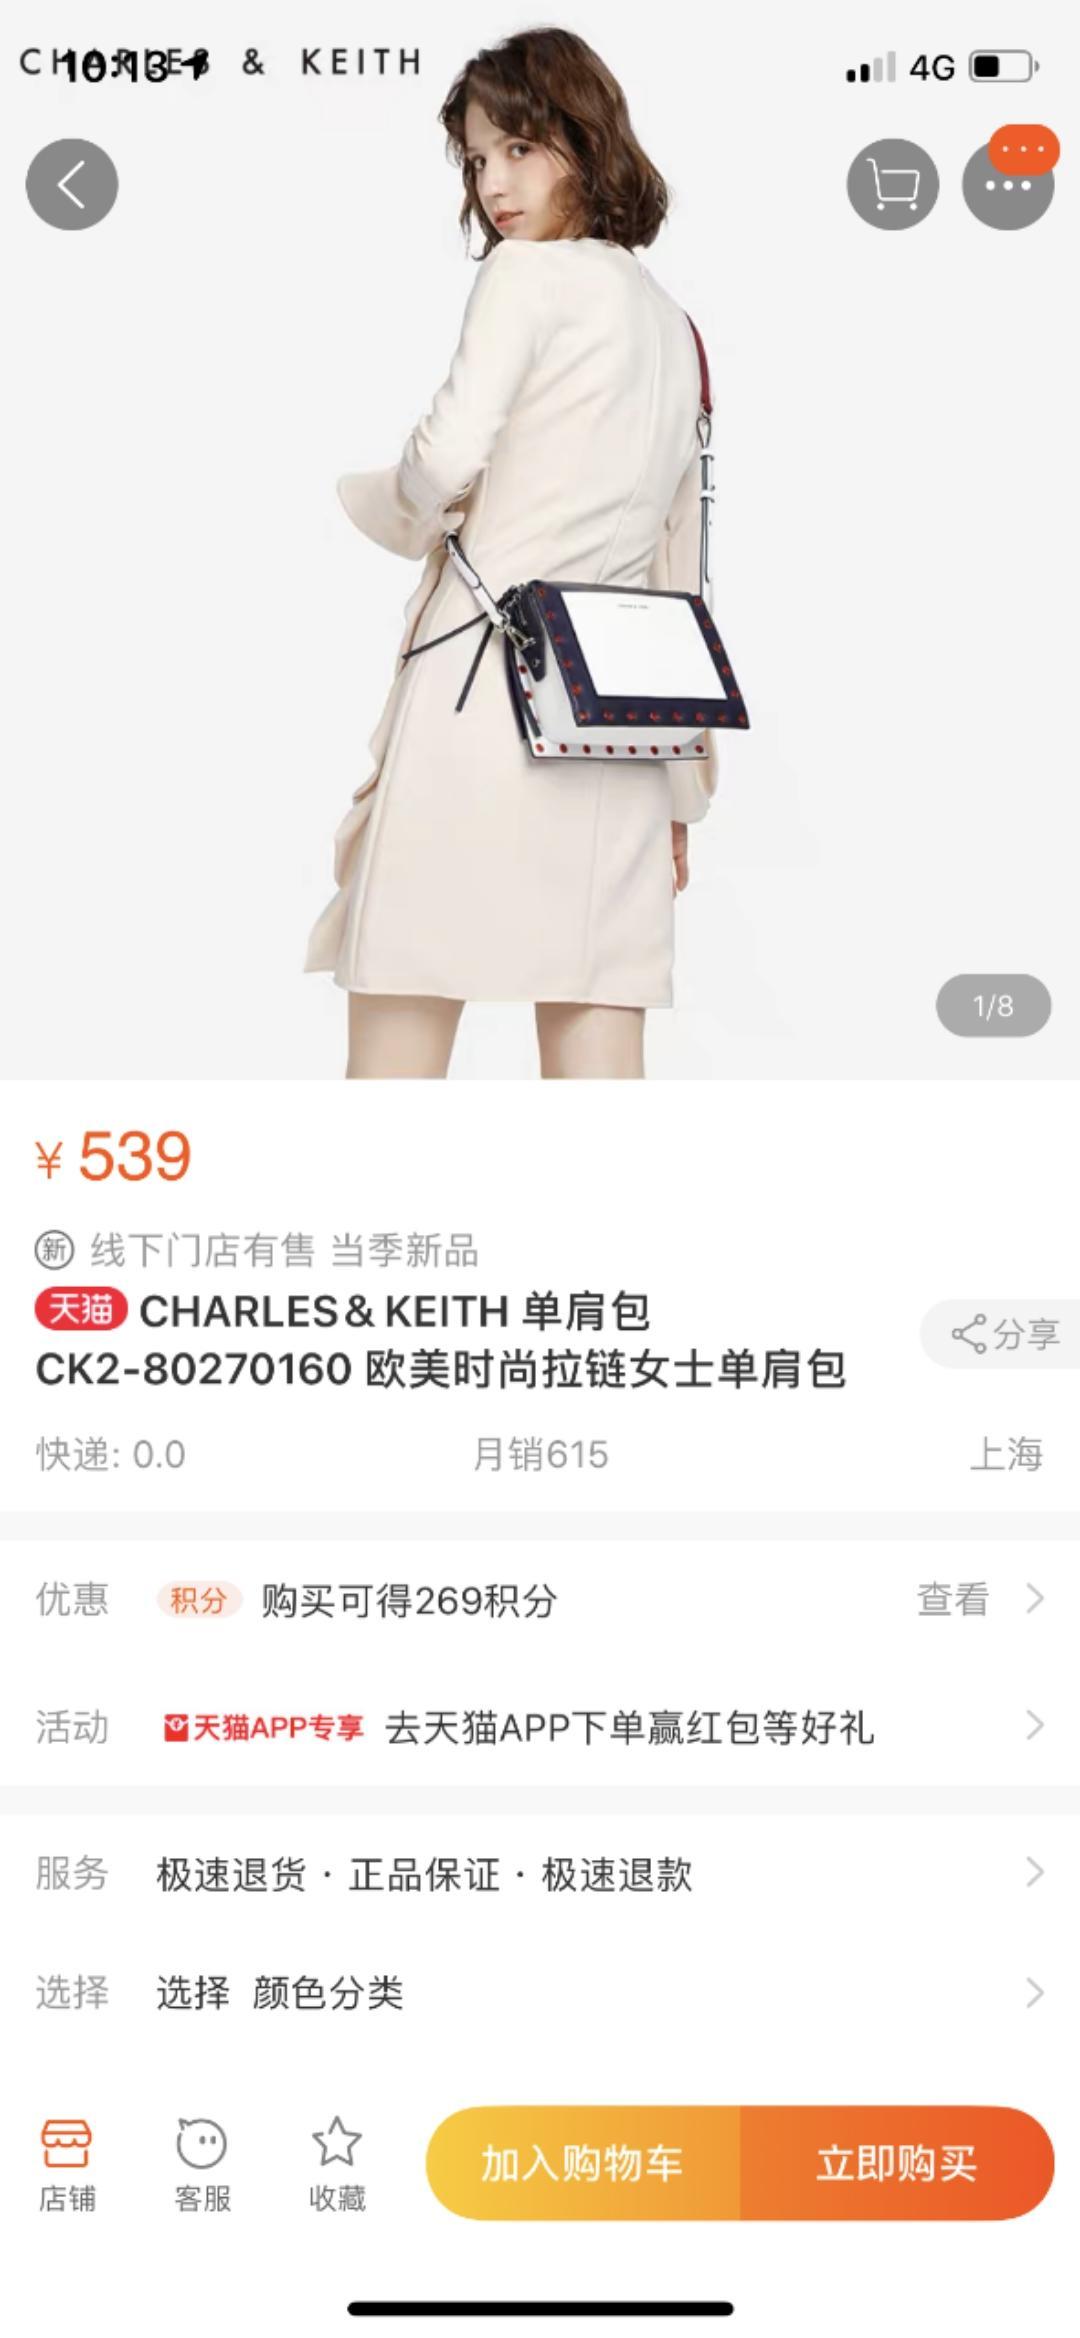 P95 CHARLES&KEITH 单肩包 CK2-80270160 欧美时尚拉链女士单肩包